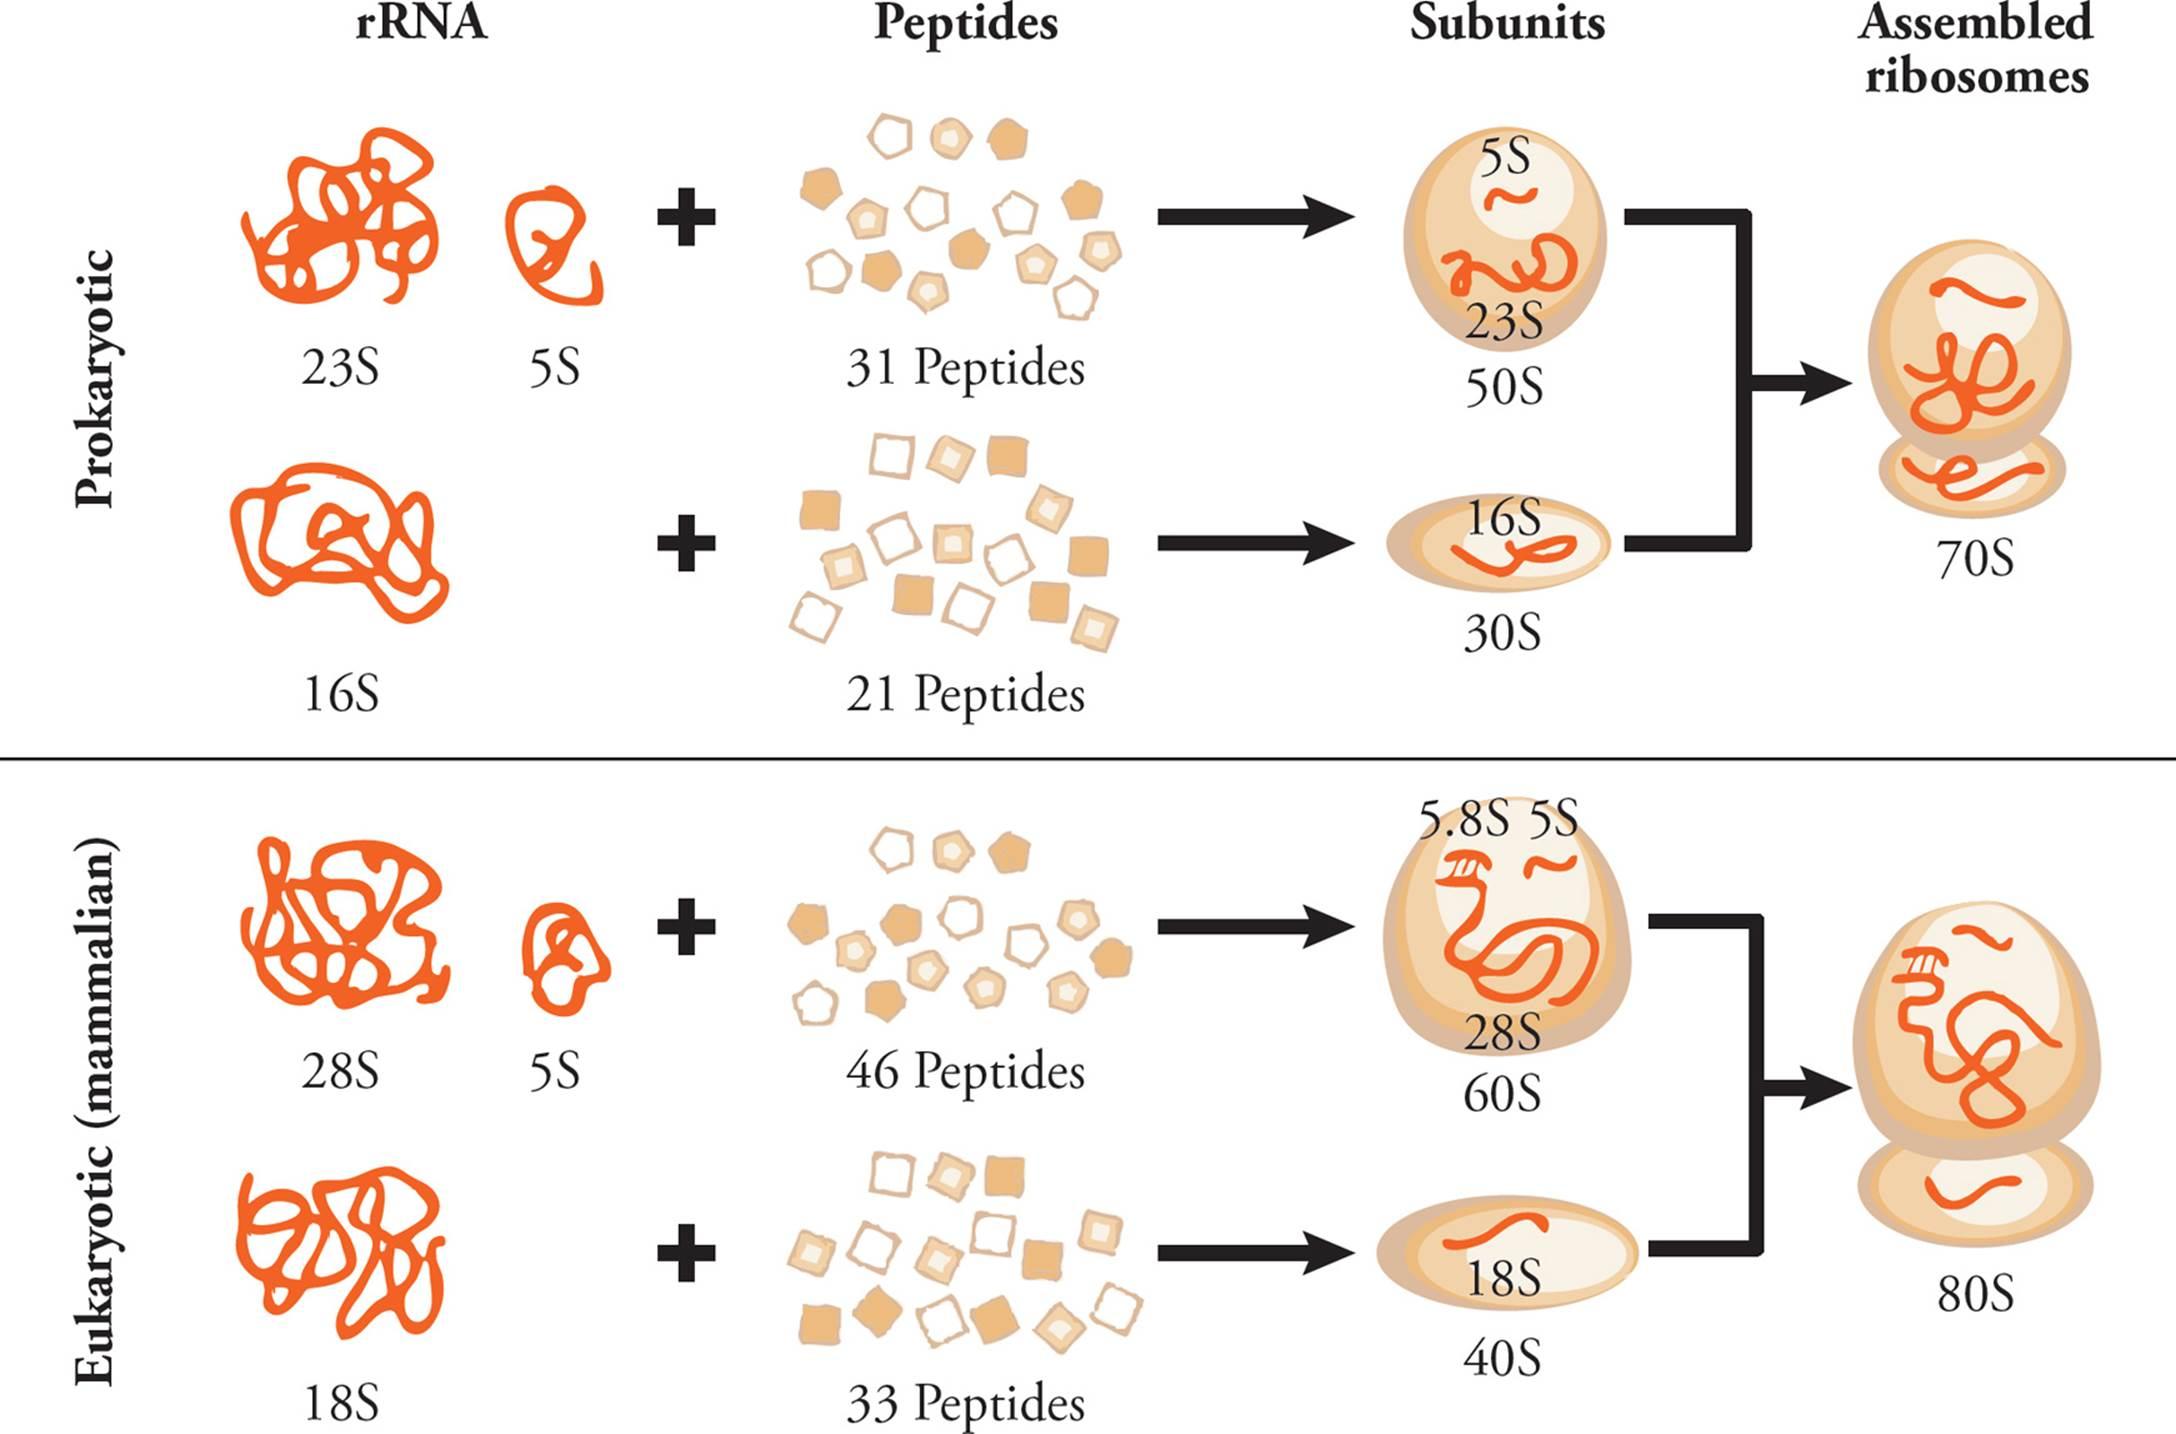 Radiosynthesis of antitumor spliceosome modulators at walmart